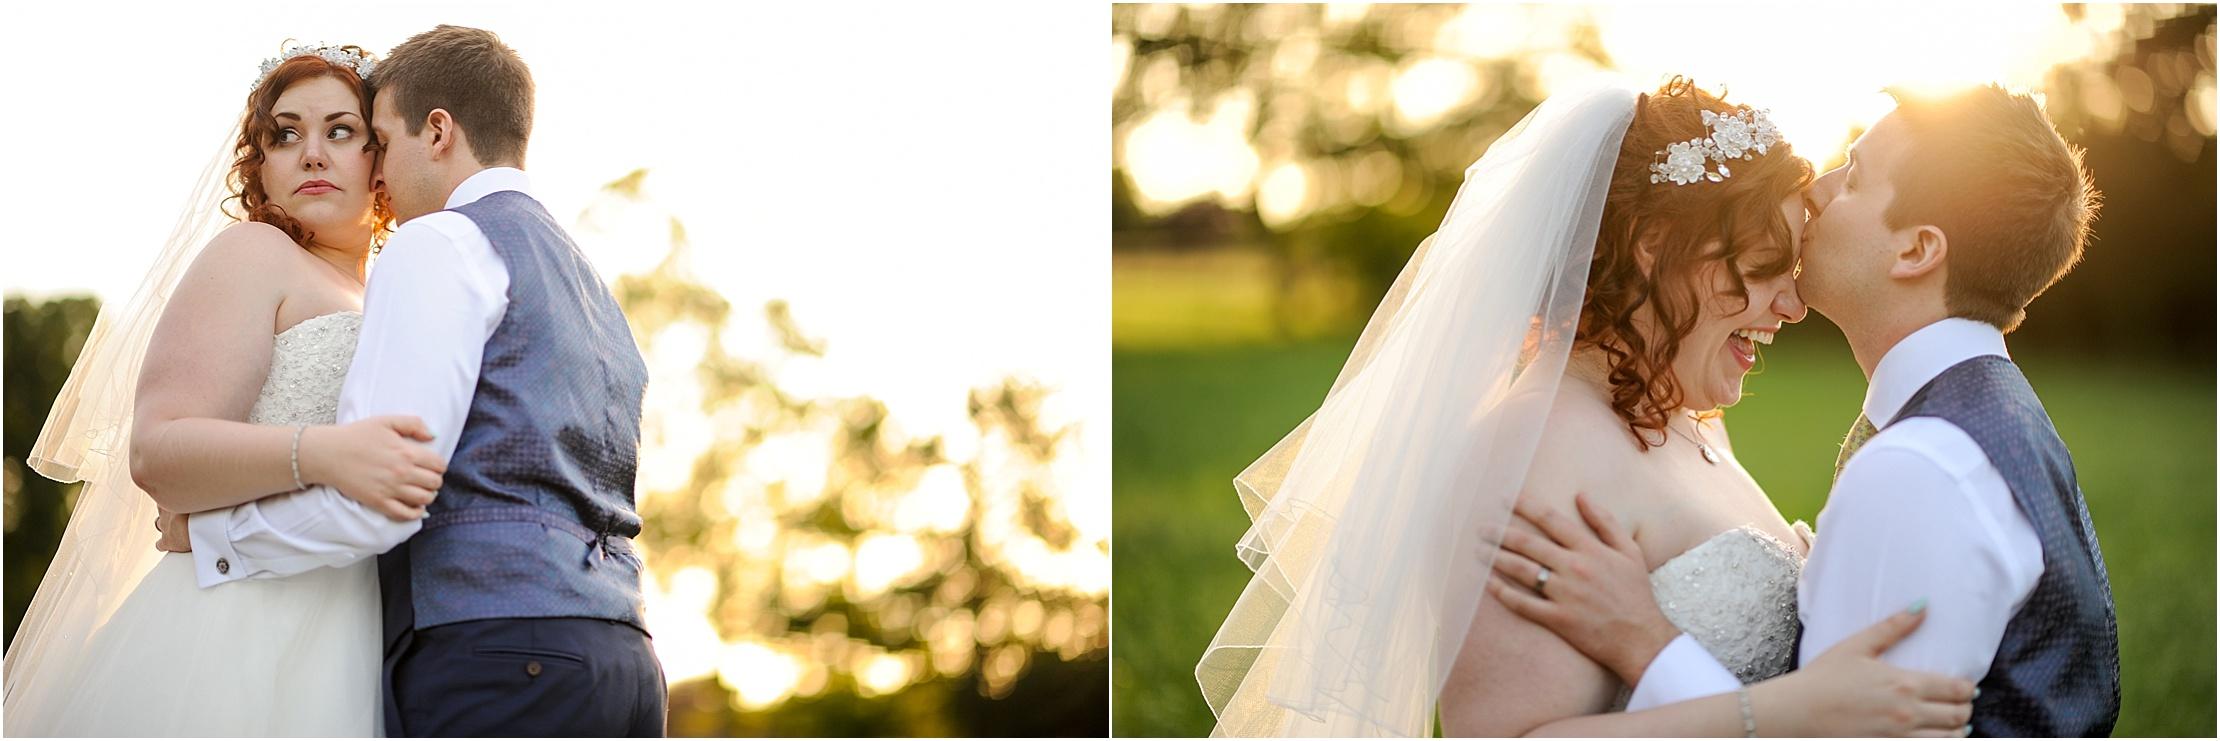 shireburn-arms-wedding- 115.jpg